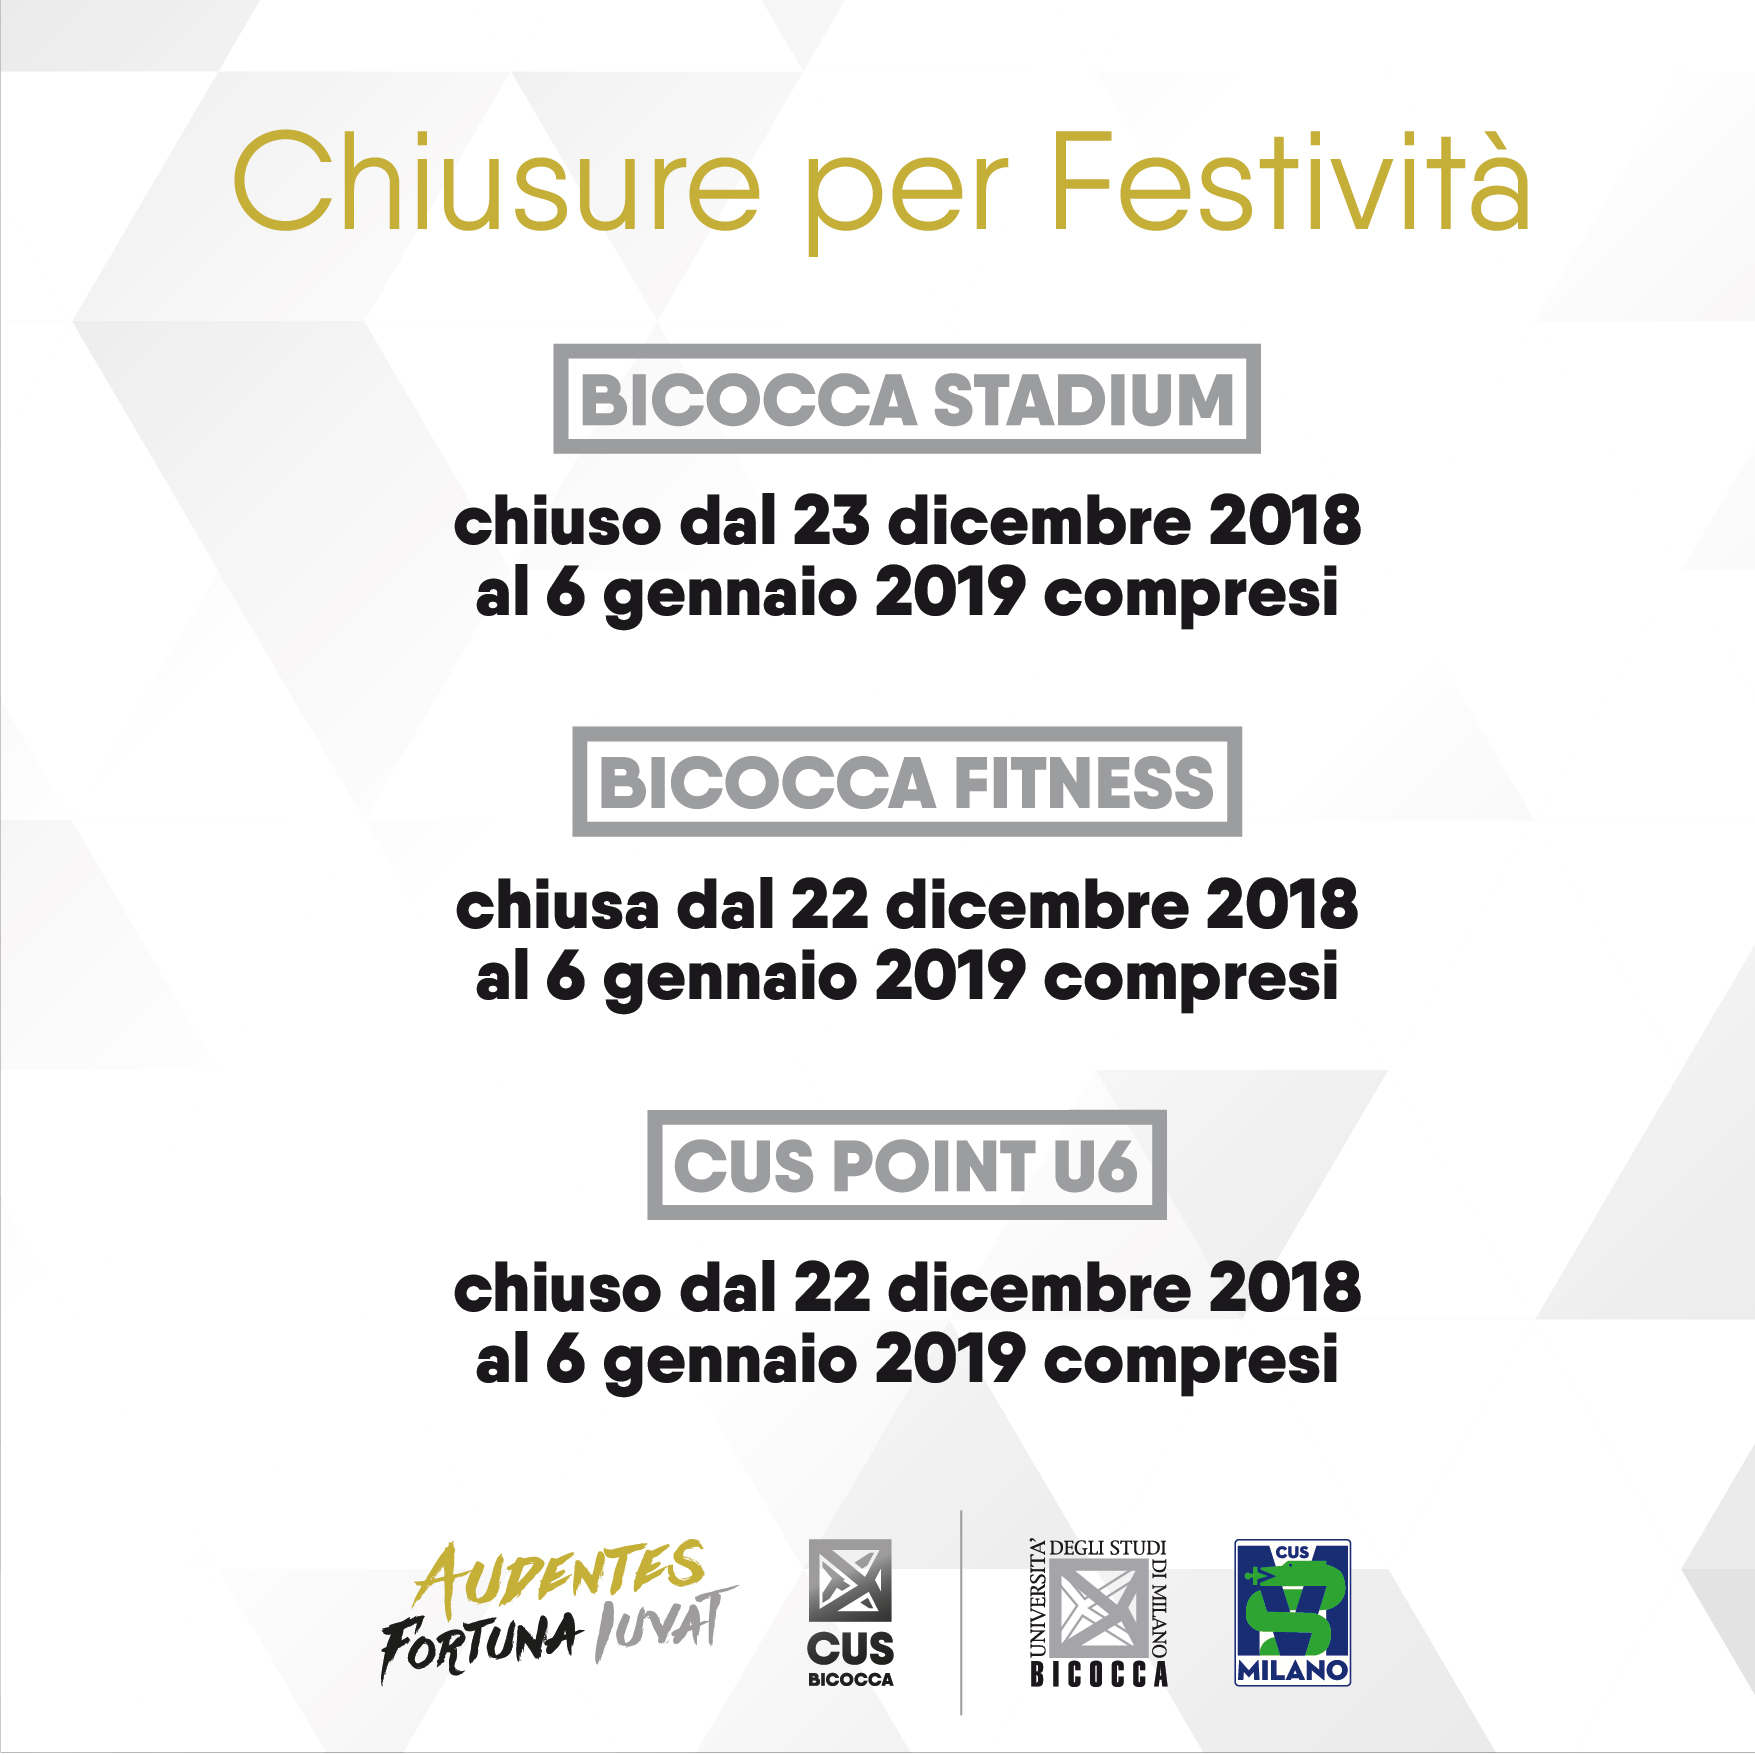 Chiusure per Festività 2018/19 – CUS Bicocca